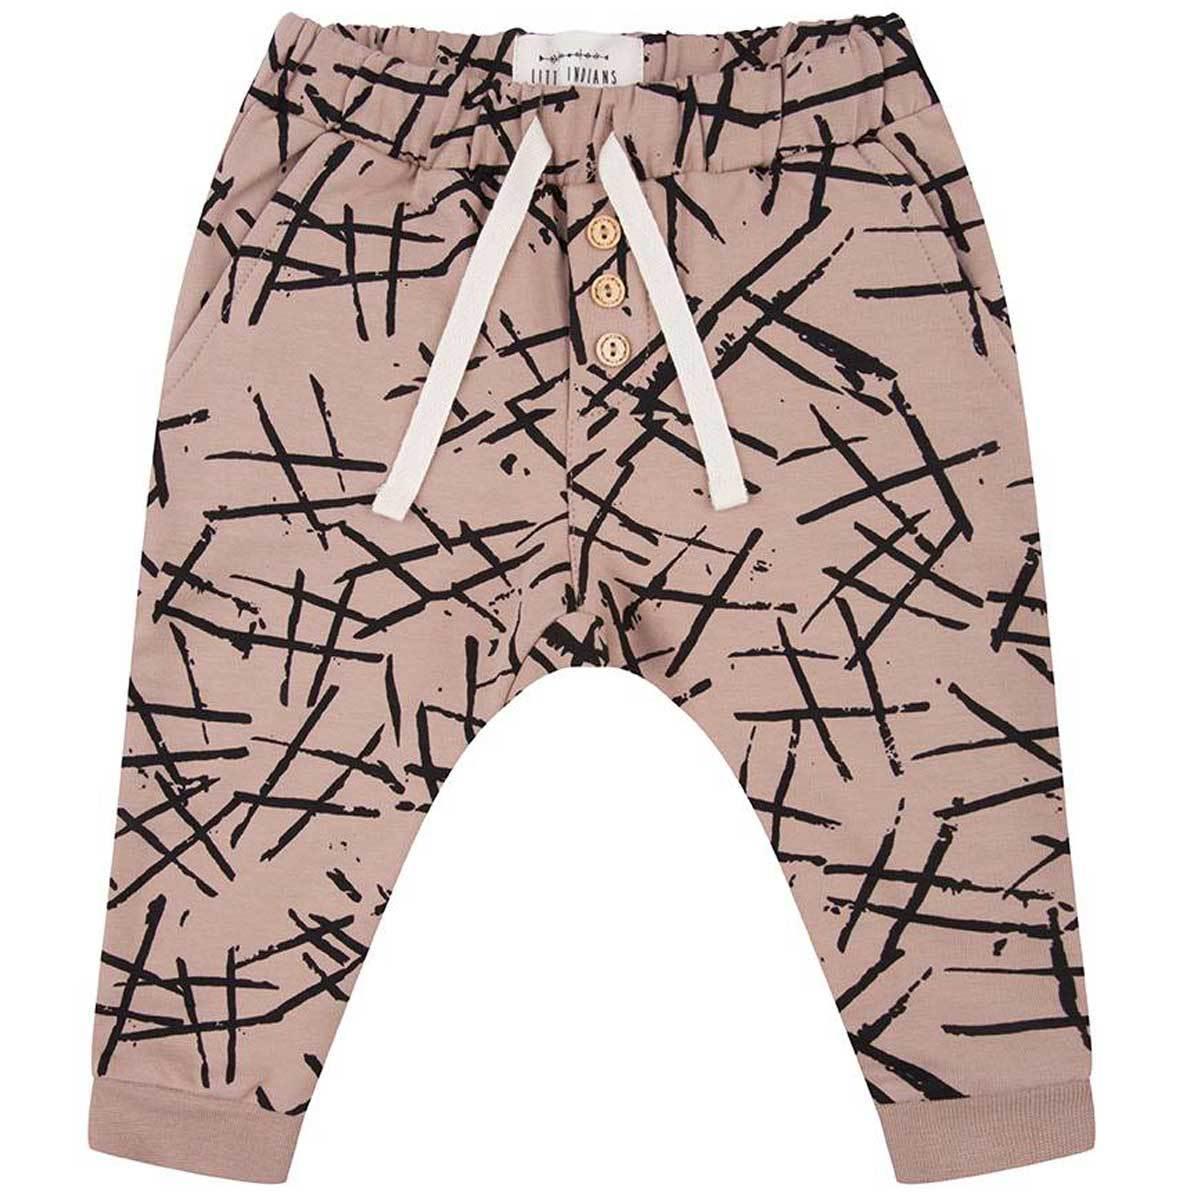 Bas Bébé Pantalon Hashtag - Warm Taupe - 6/9 mois Pantalon Hashtag - Warm Taupe - 6/9 mois